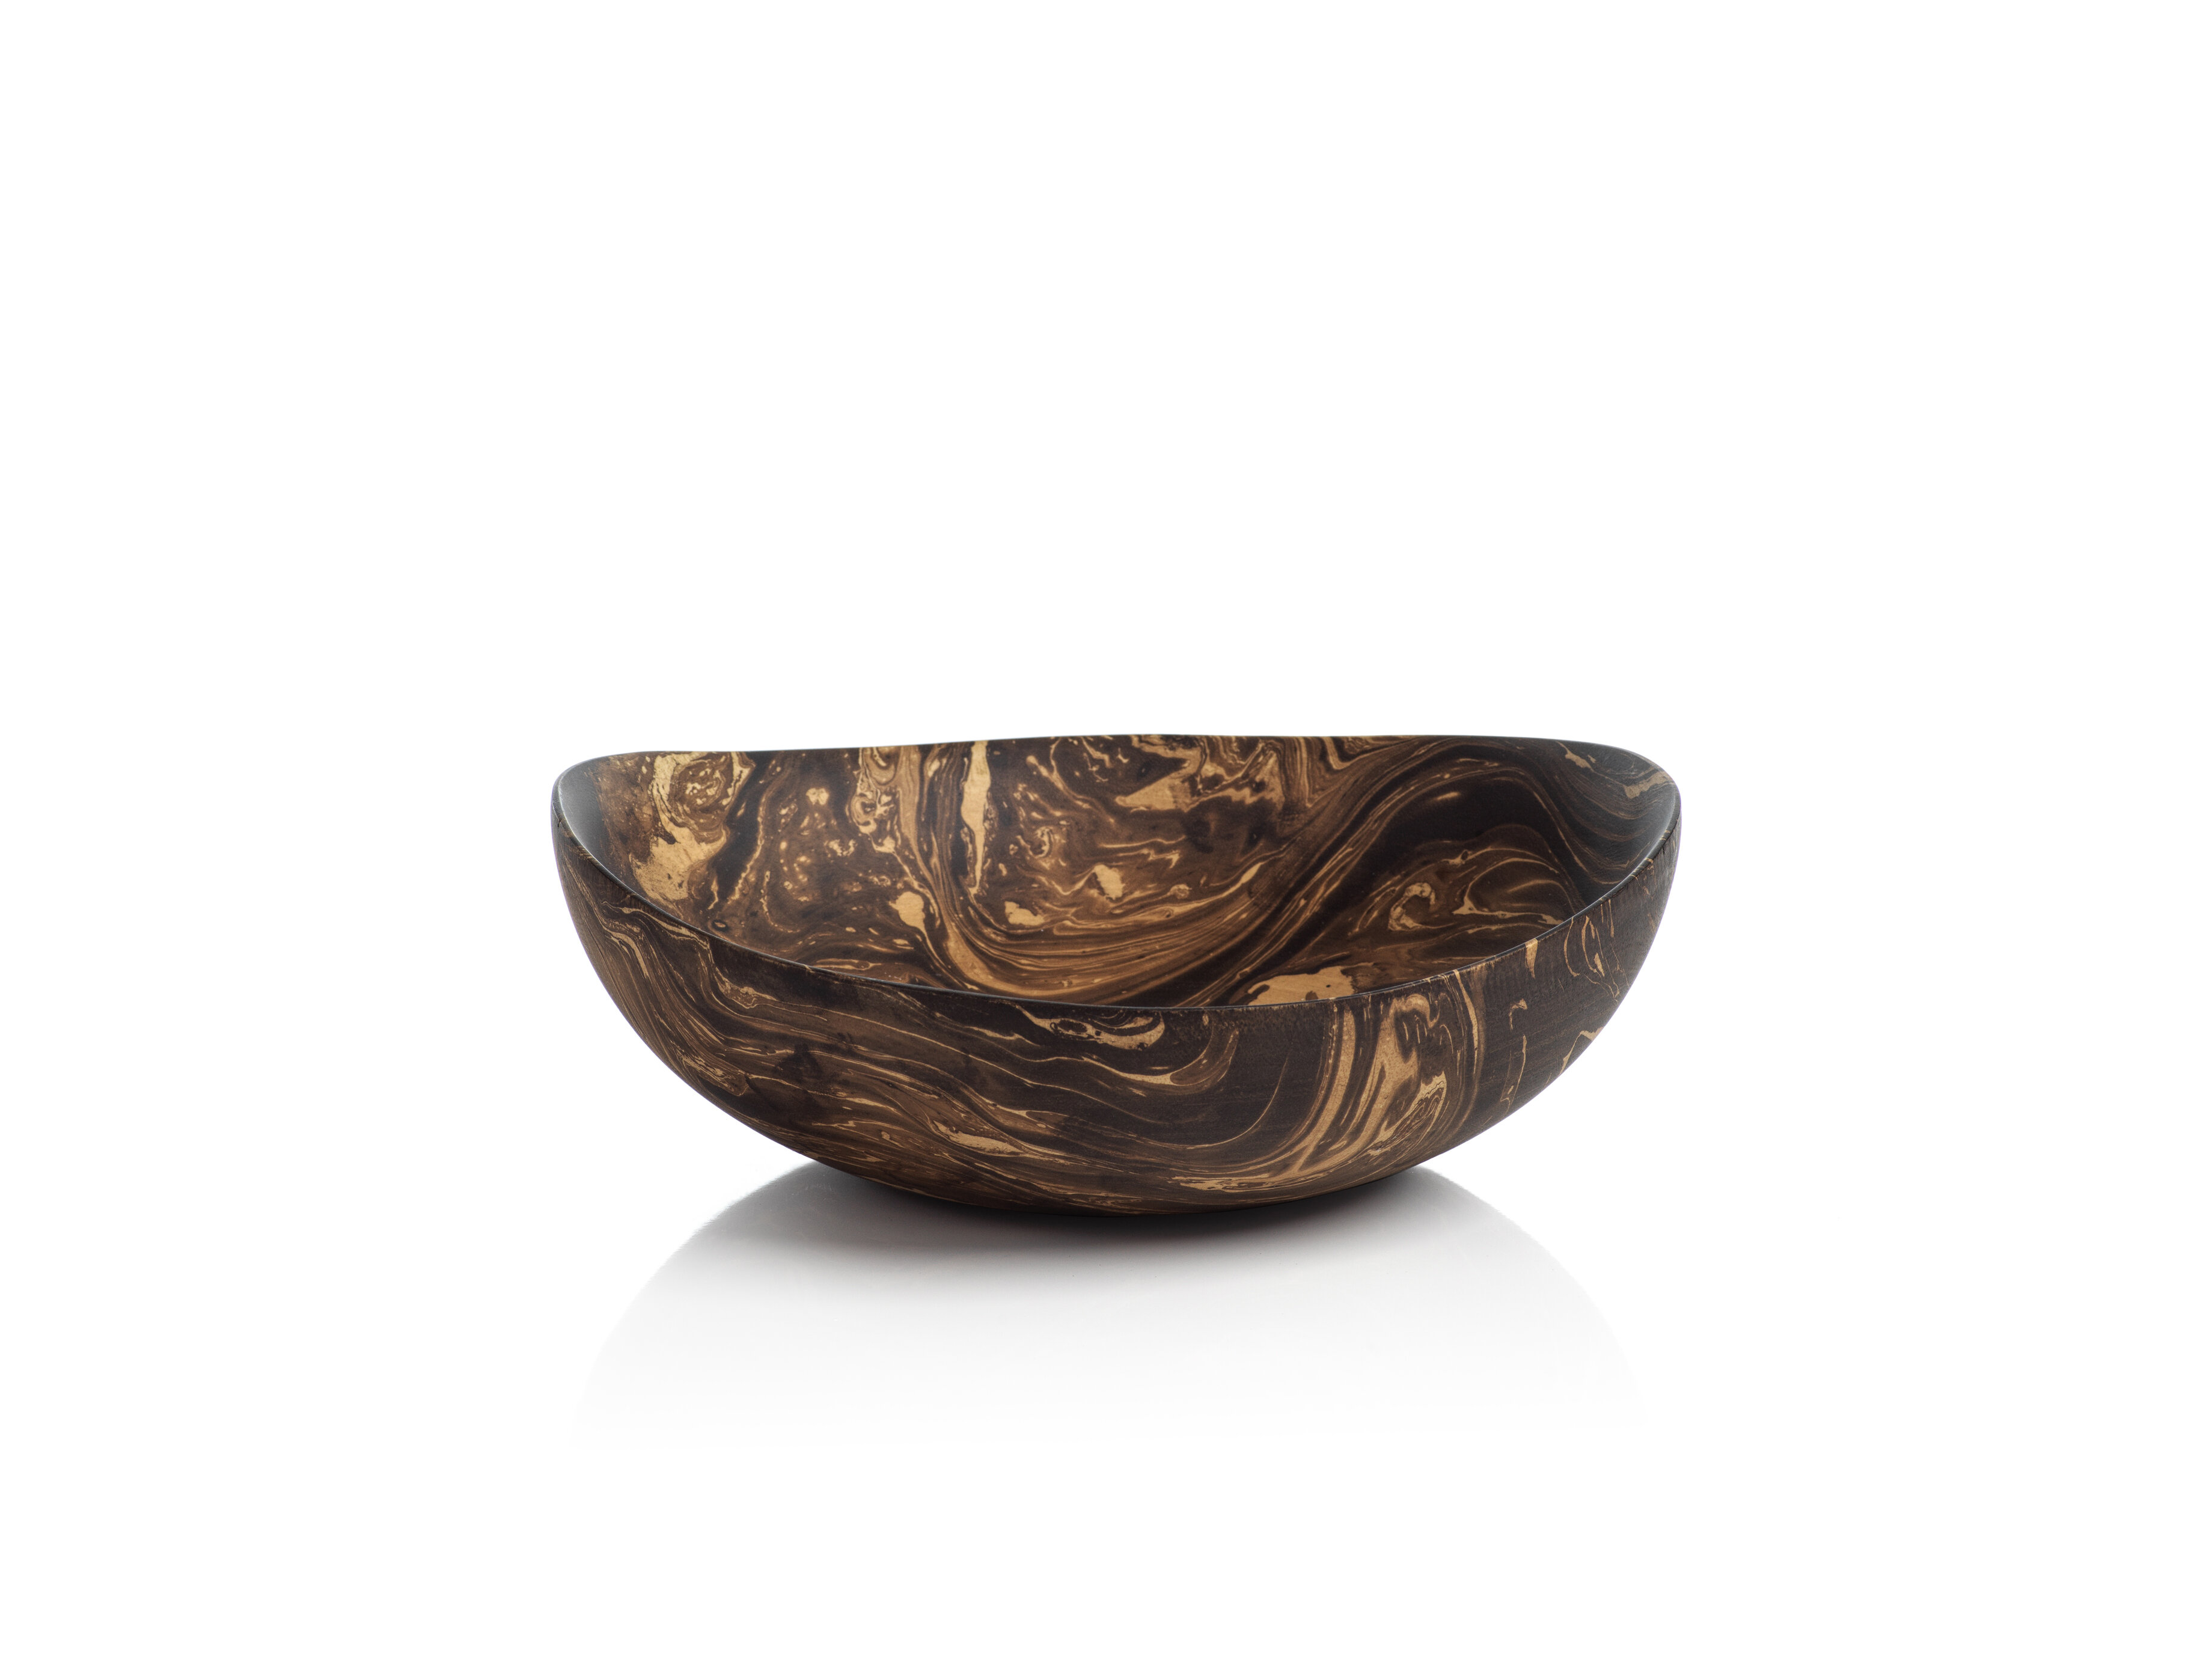 Black Brown Decorative Plates Bowls You Ll Love In 2021 Wayfair